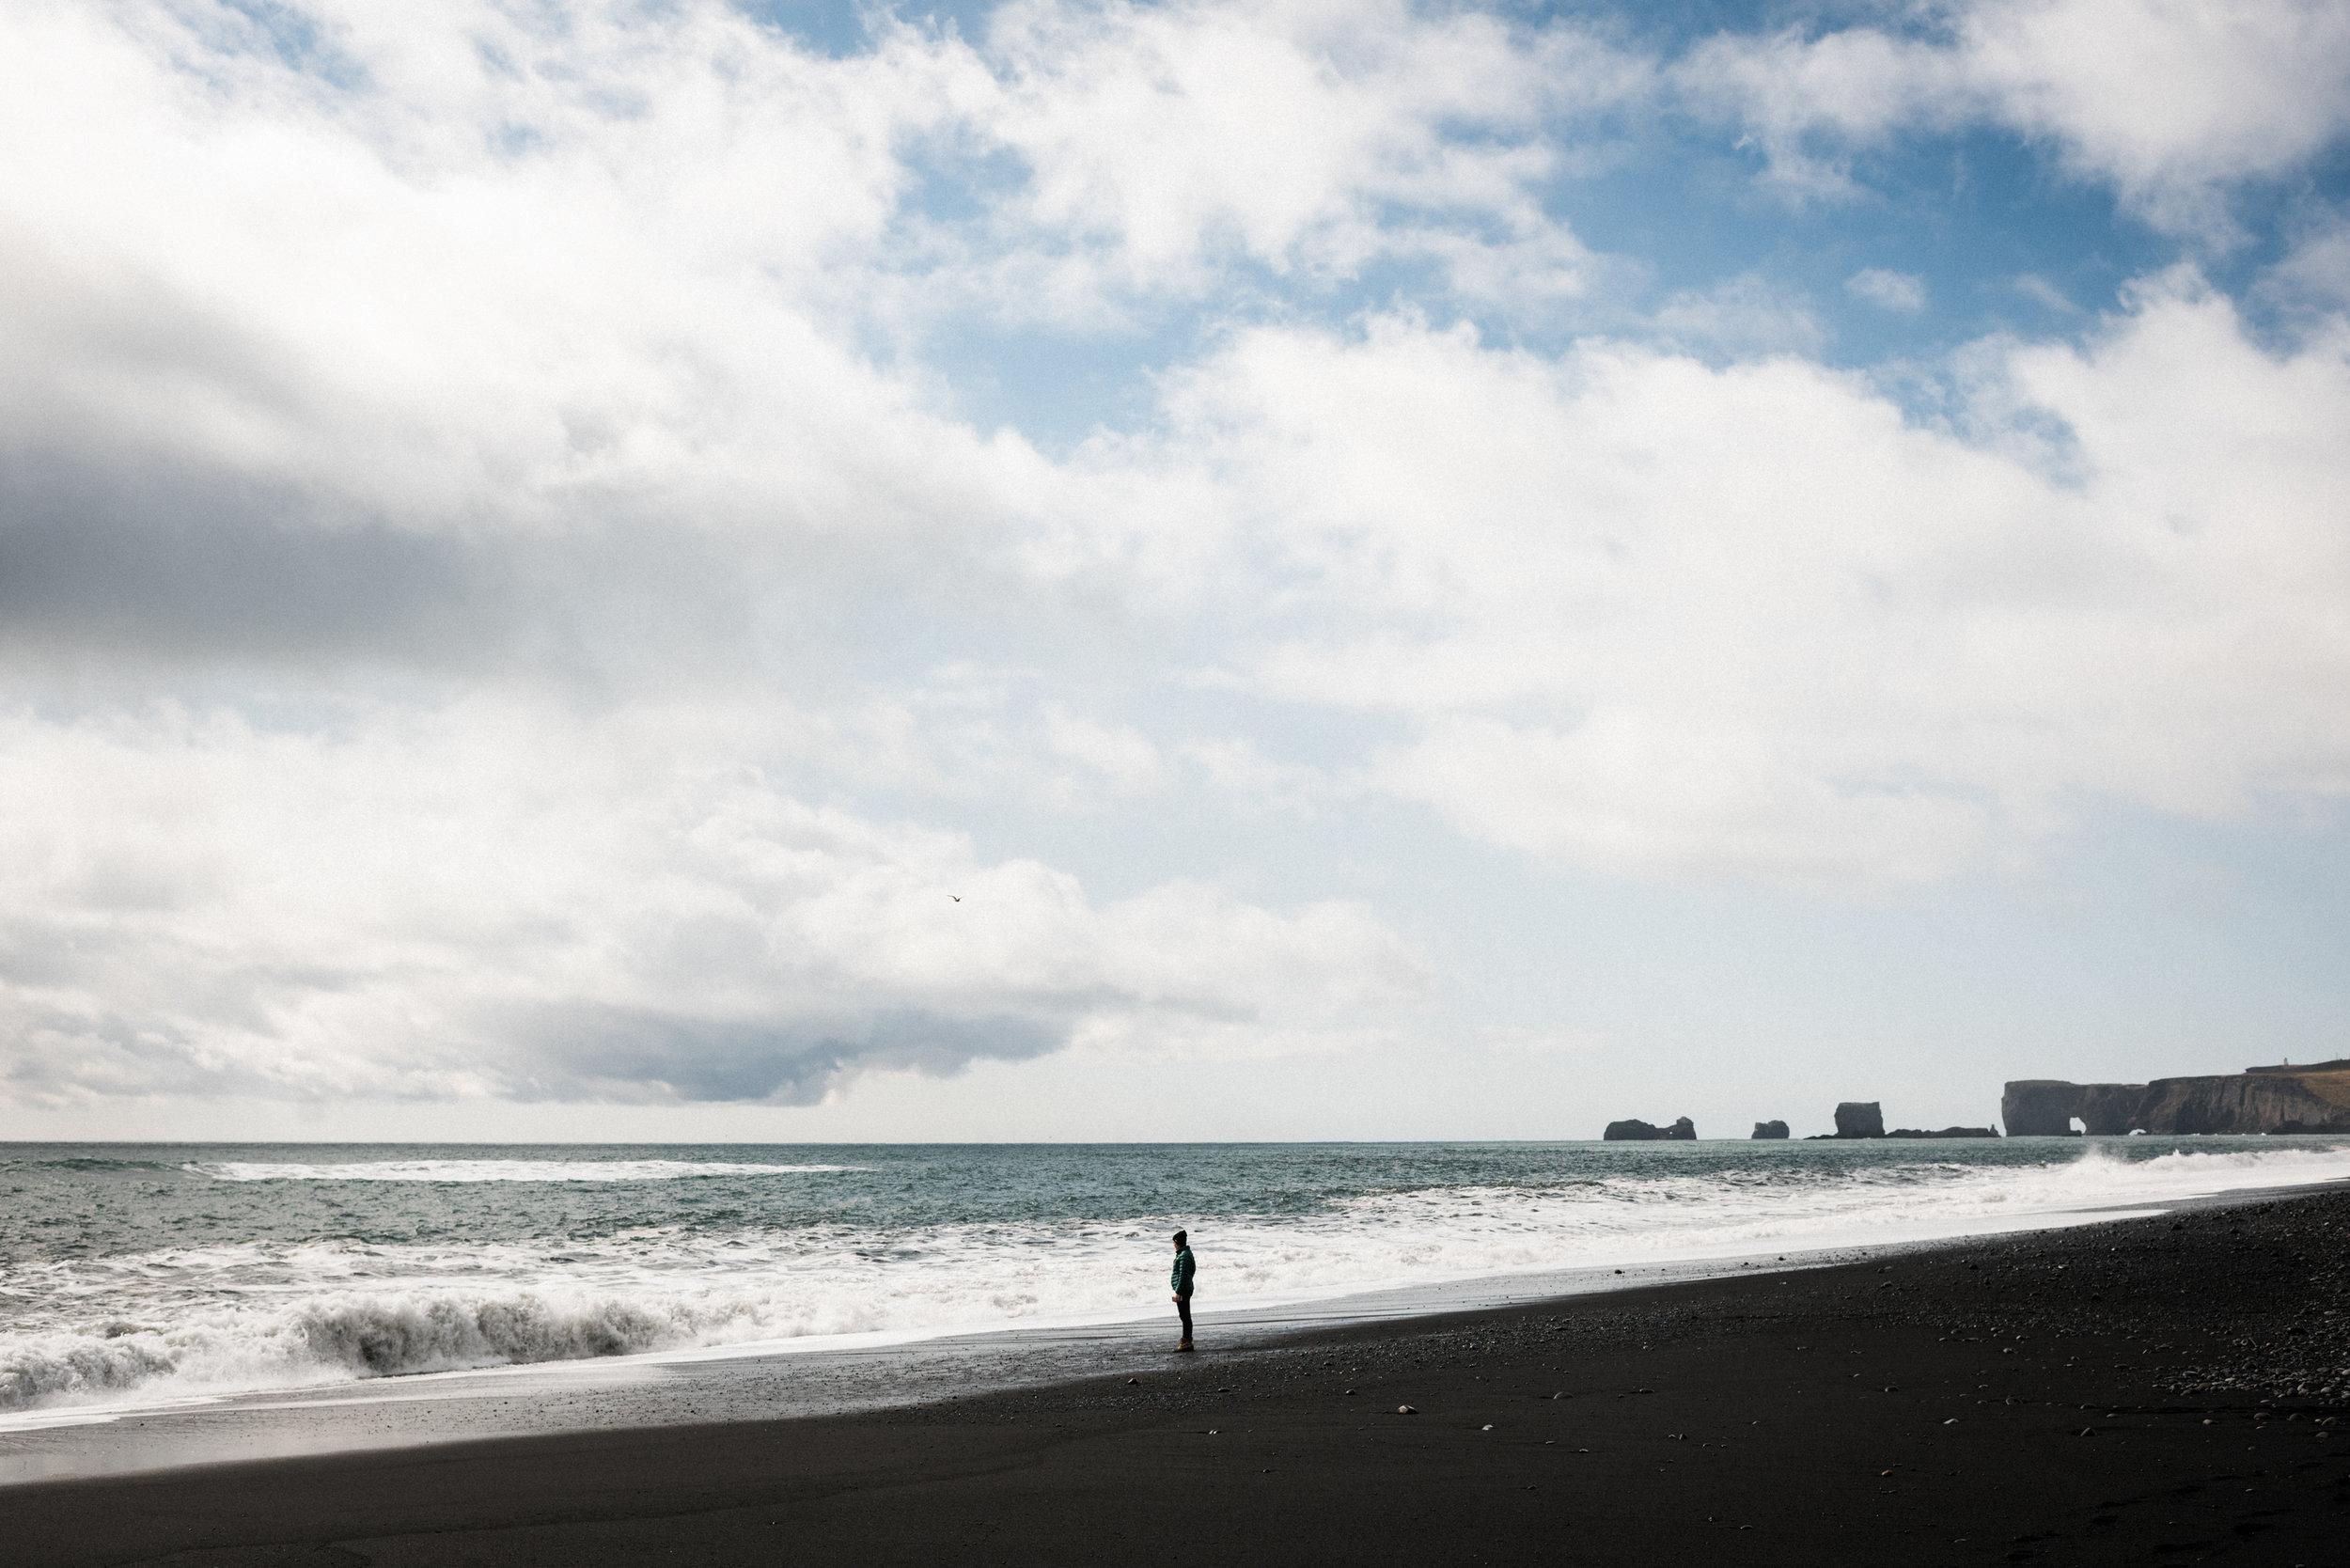 ICELAND_WOMAN_PHOTOGRAPHER_TARASHUPE_OUTDOOR_PHOTOGRAPHY_135.jpg